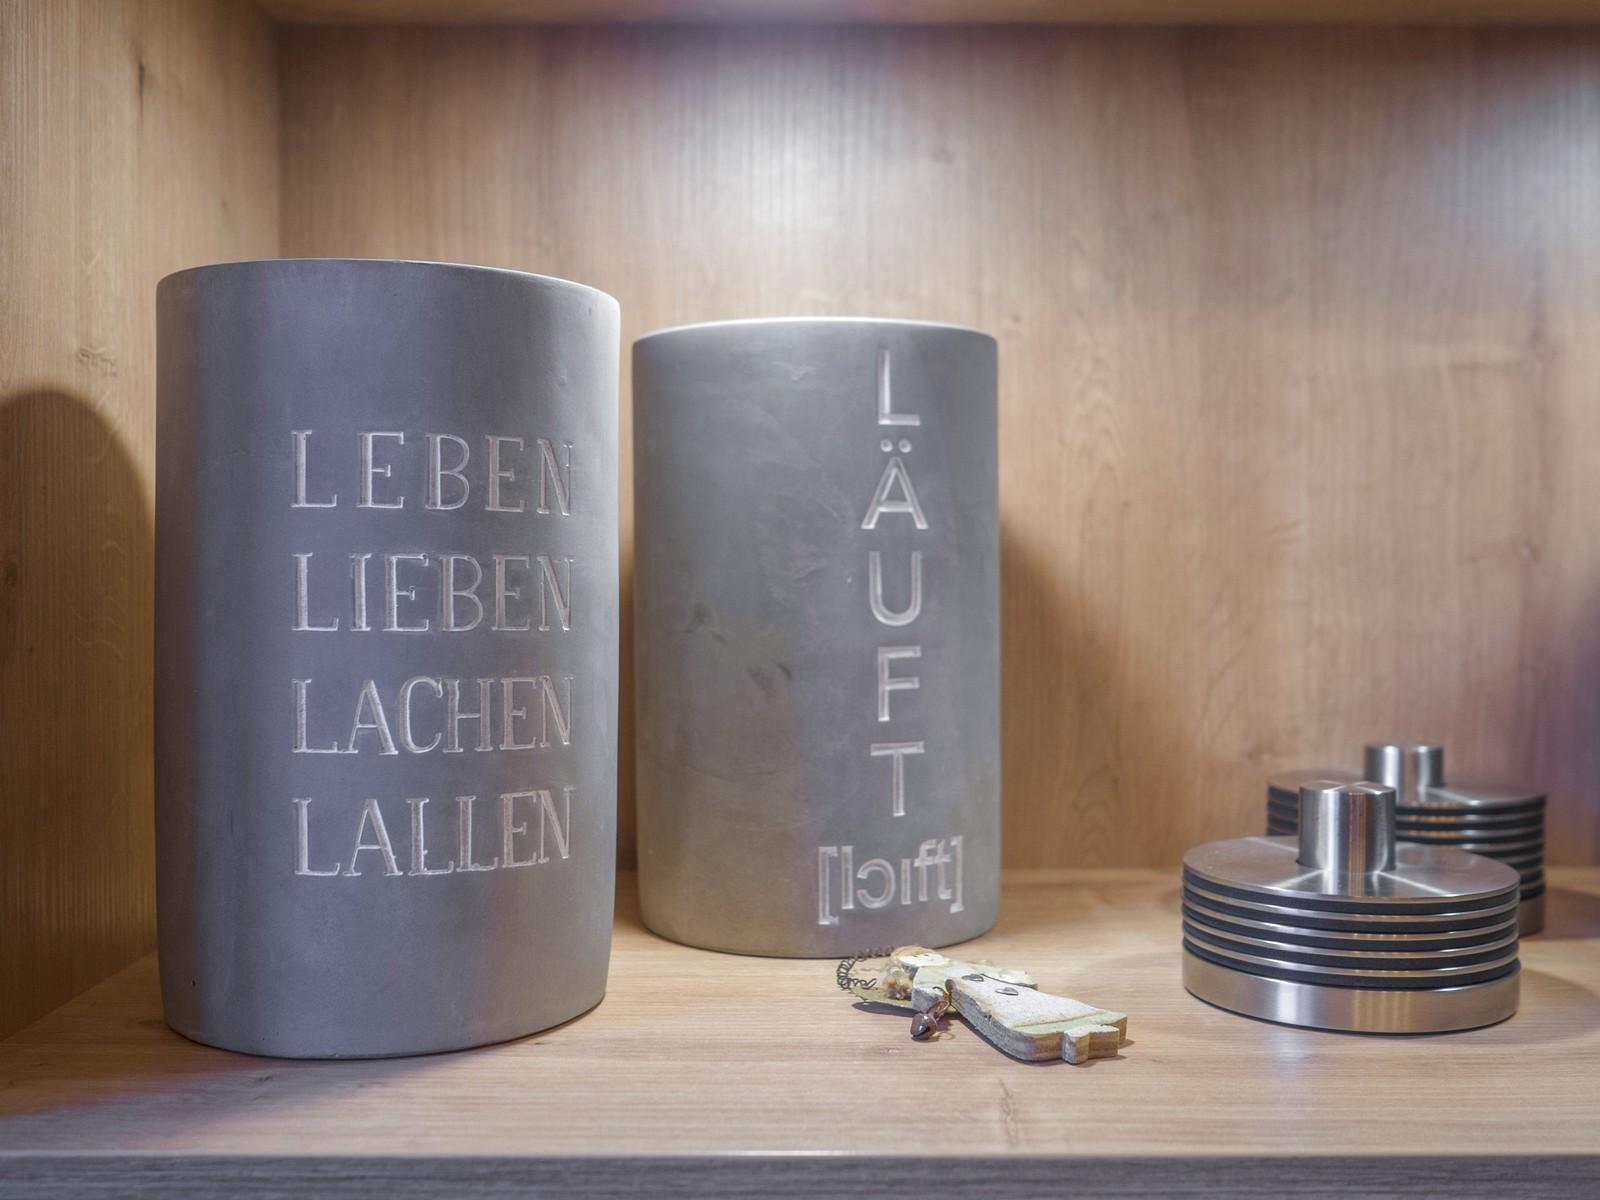 Offene U Form Leicht Kueche Carbongrau Holz Eiche Dekton Keramikspuele Miele Muldenkochfeld 2